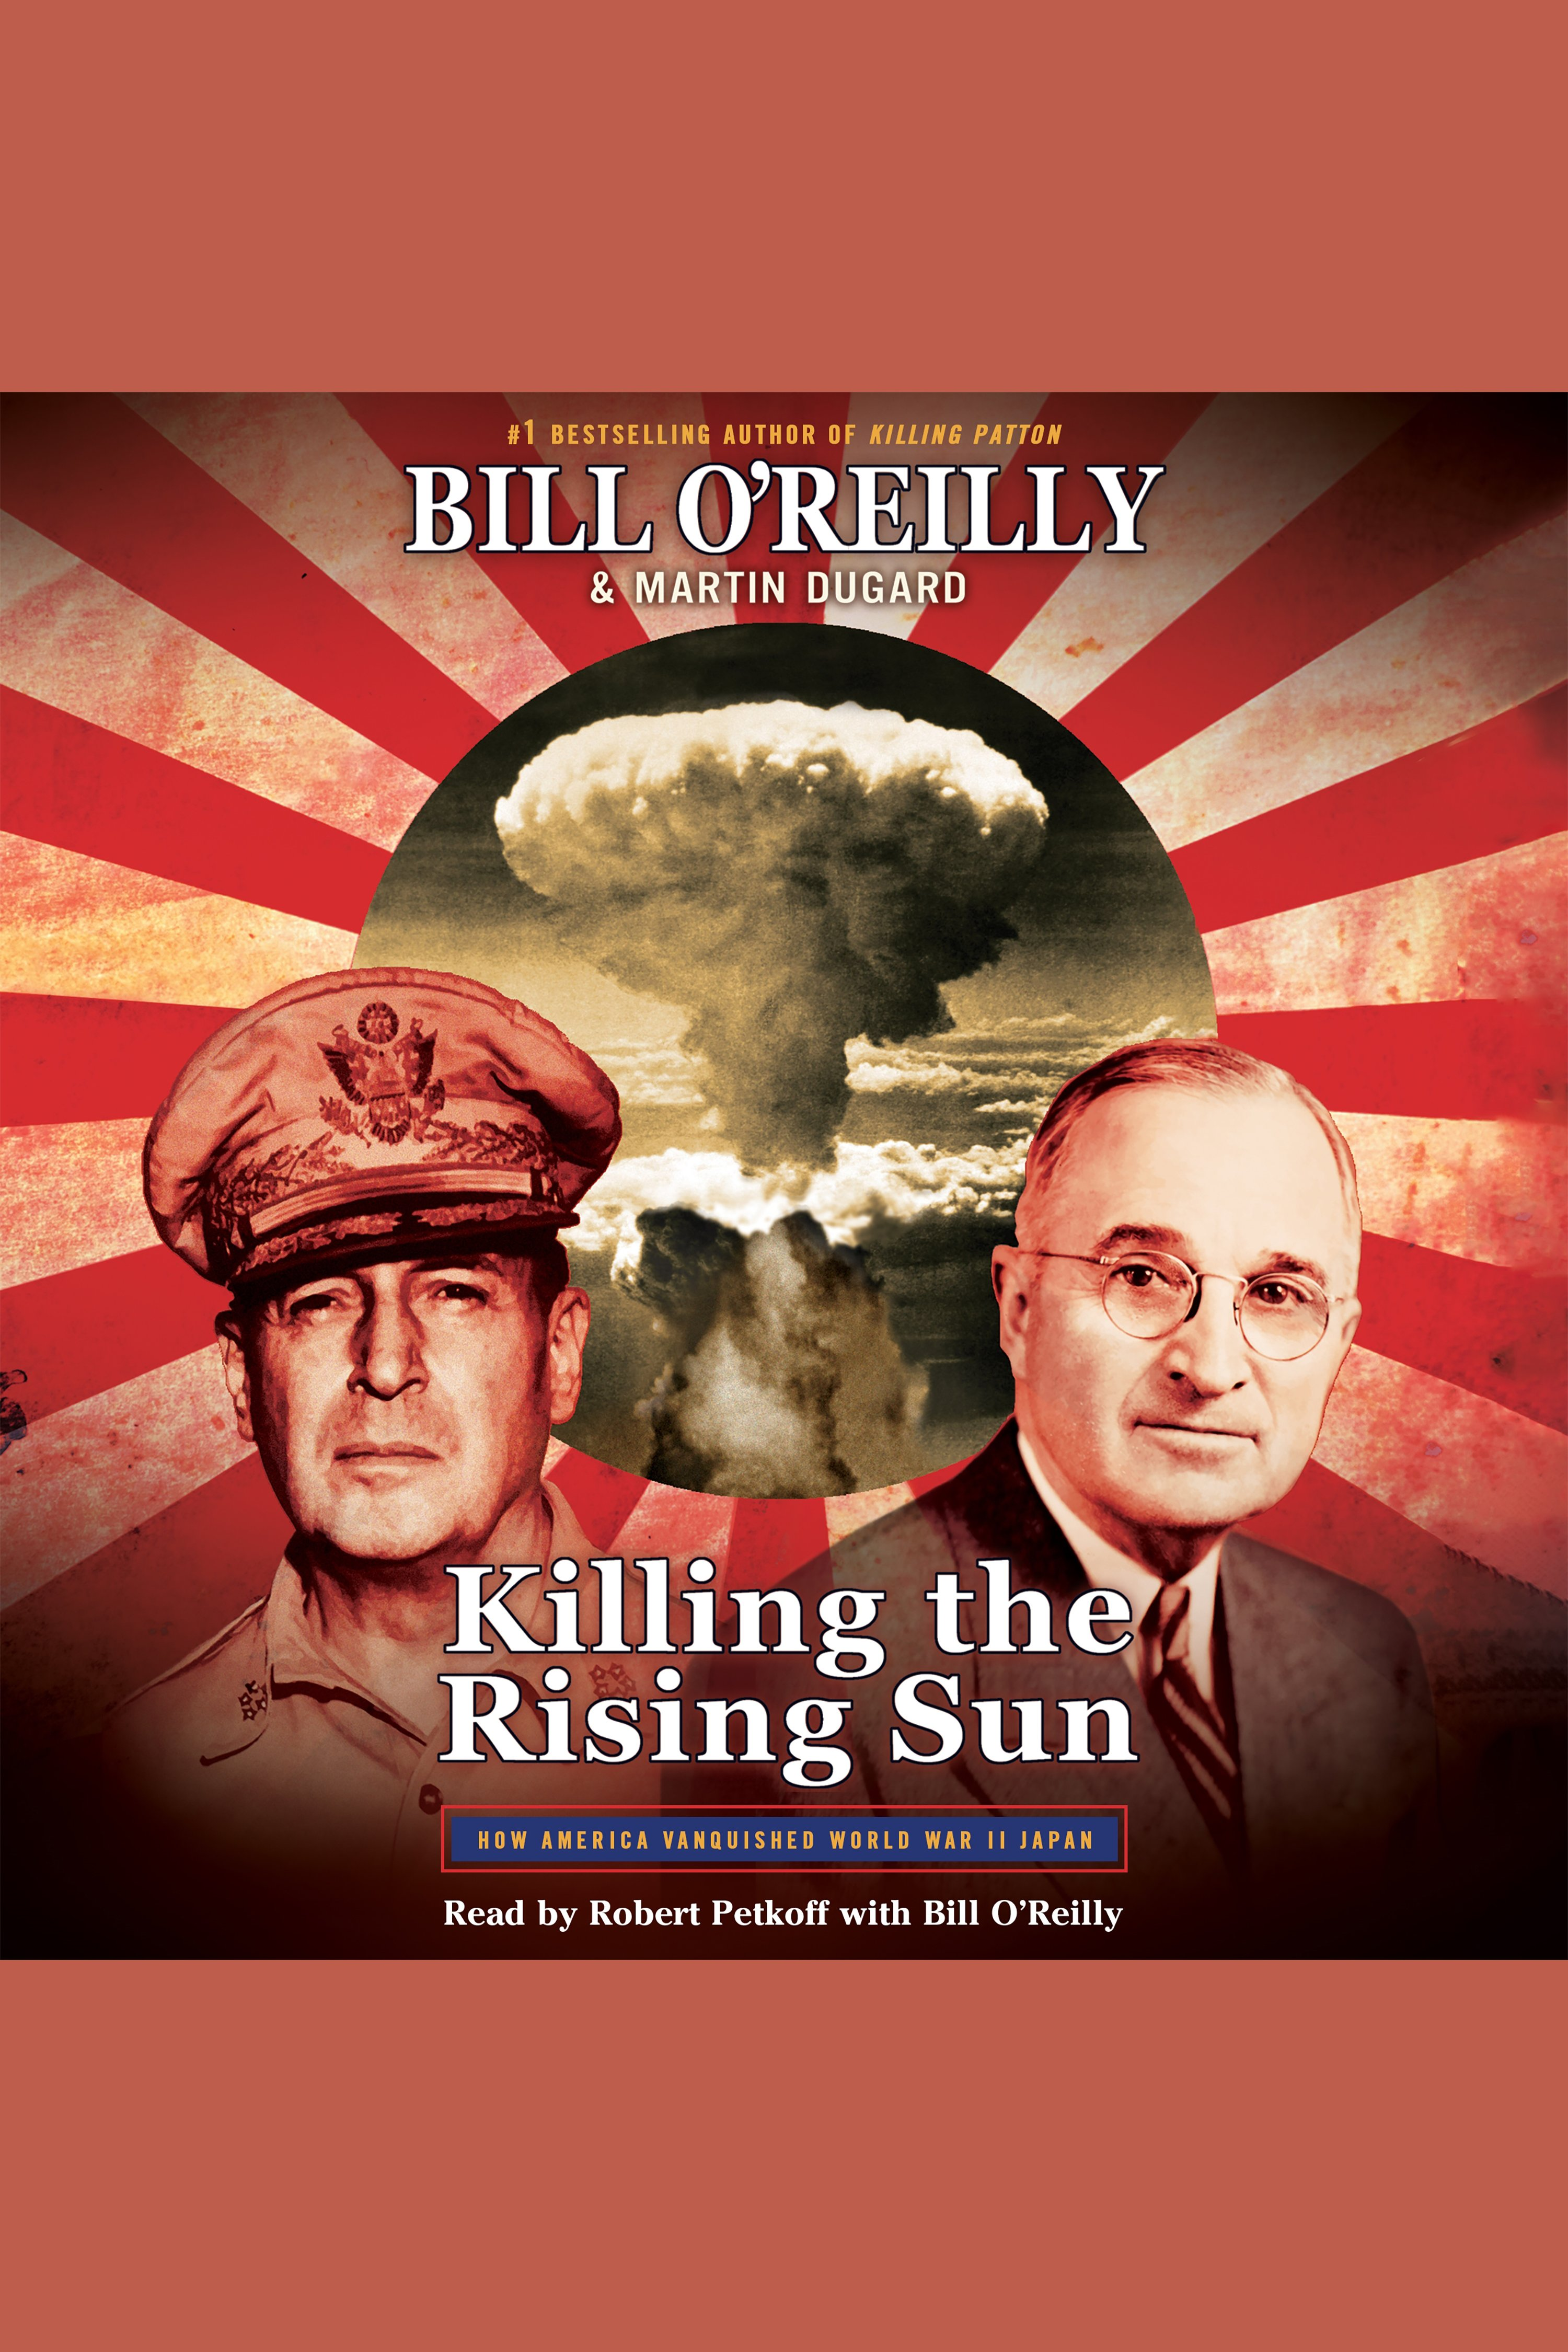 Killing the Rising Sun [AUDIO EBOOK] How America Vanquished World War II Japan